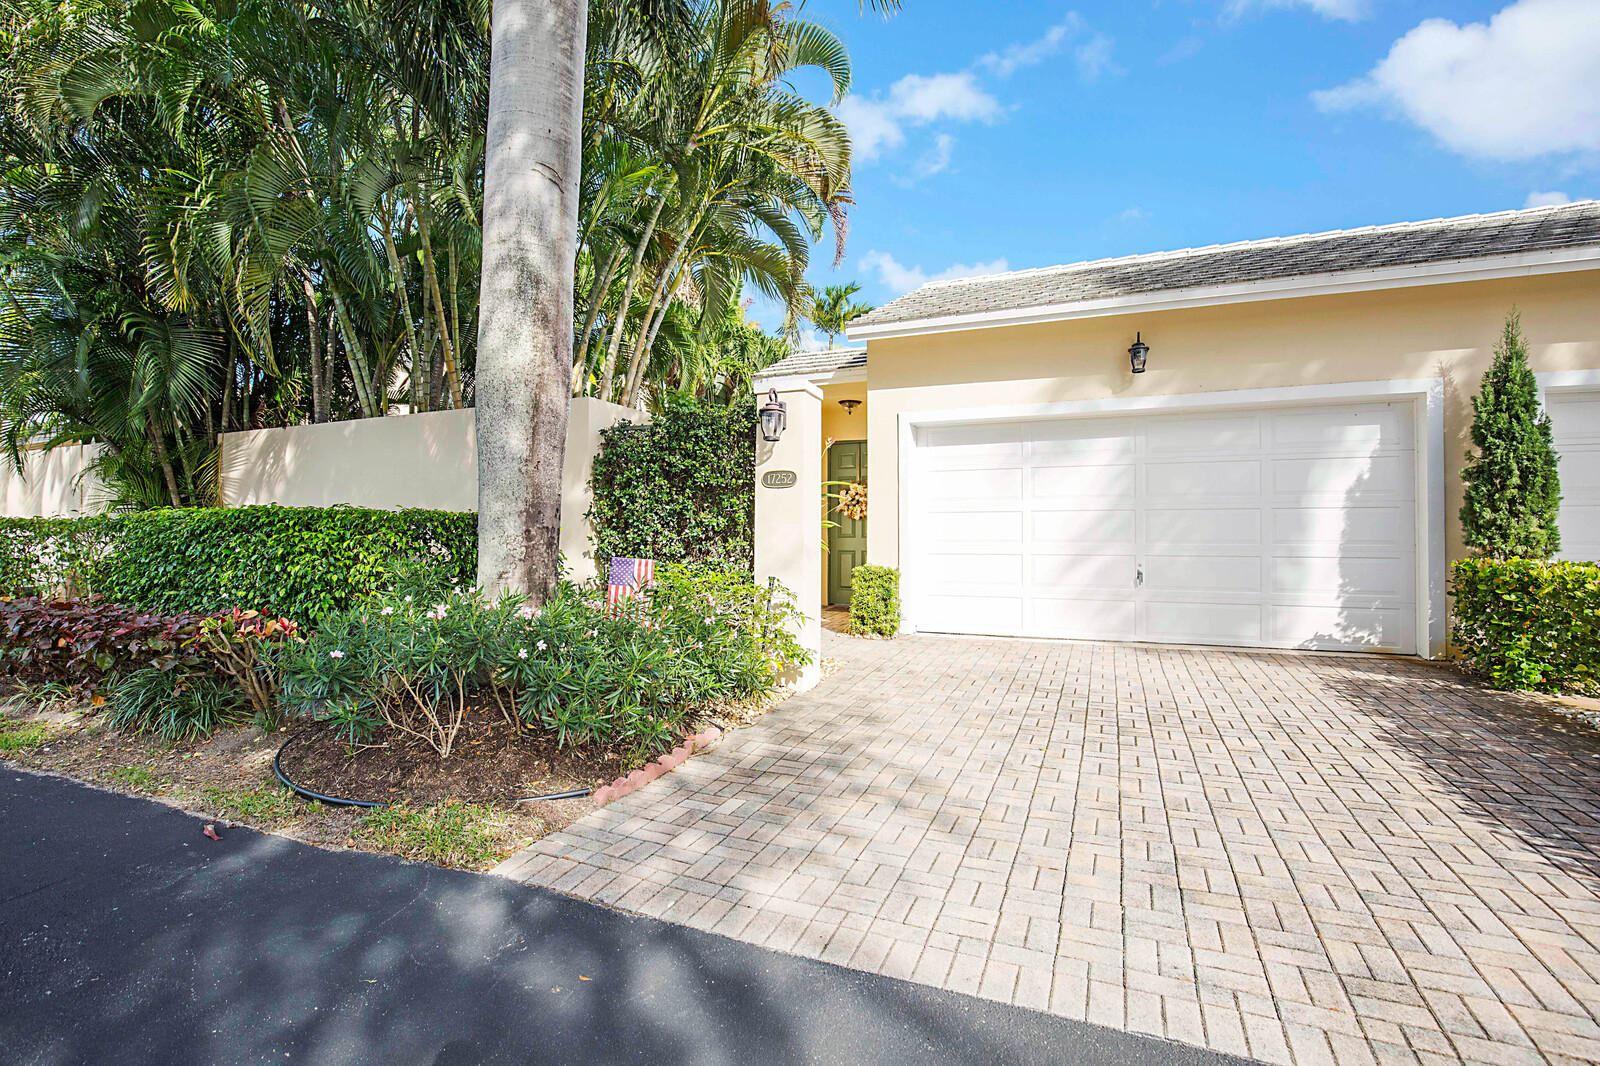 17252 Bermuda Village Drive, Boca Raton, FL 33487 - #: RX-10673386